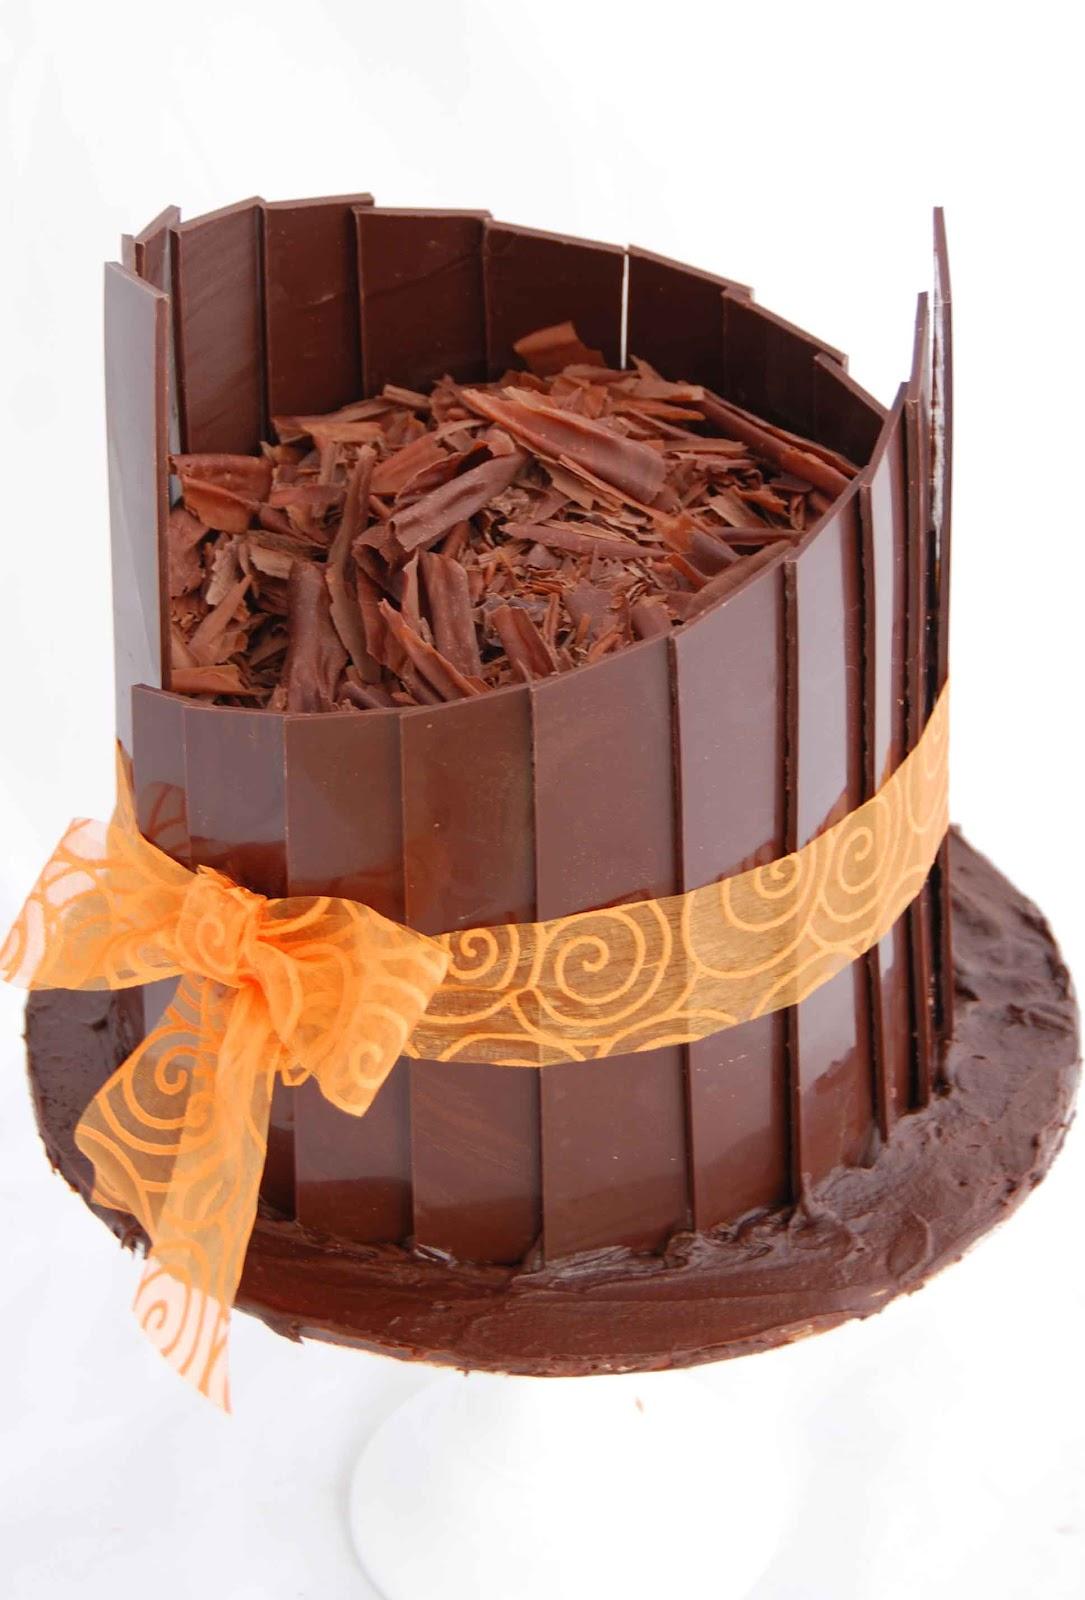 Decorating Cake With Chocolate Shards